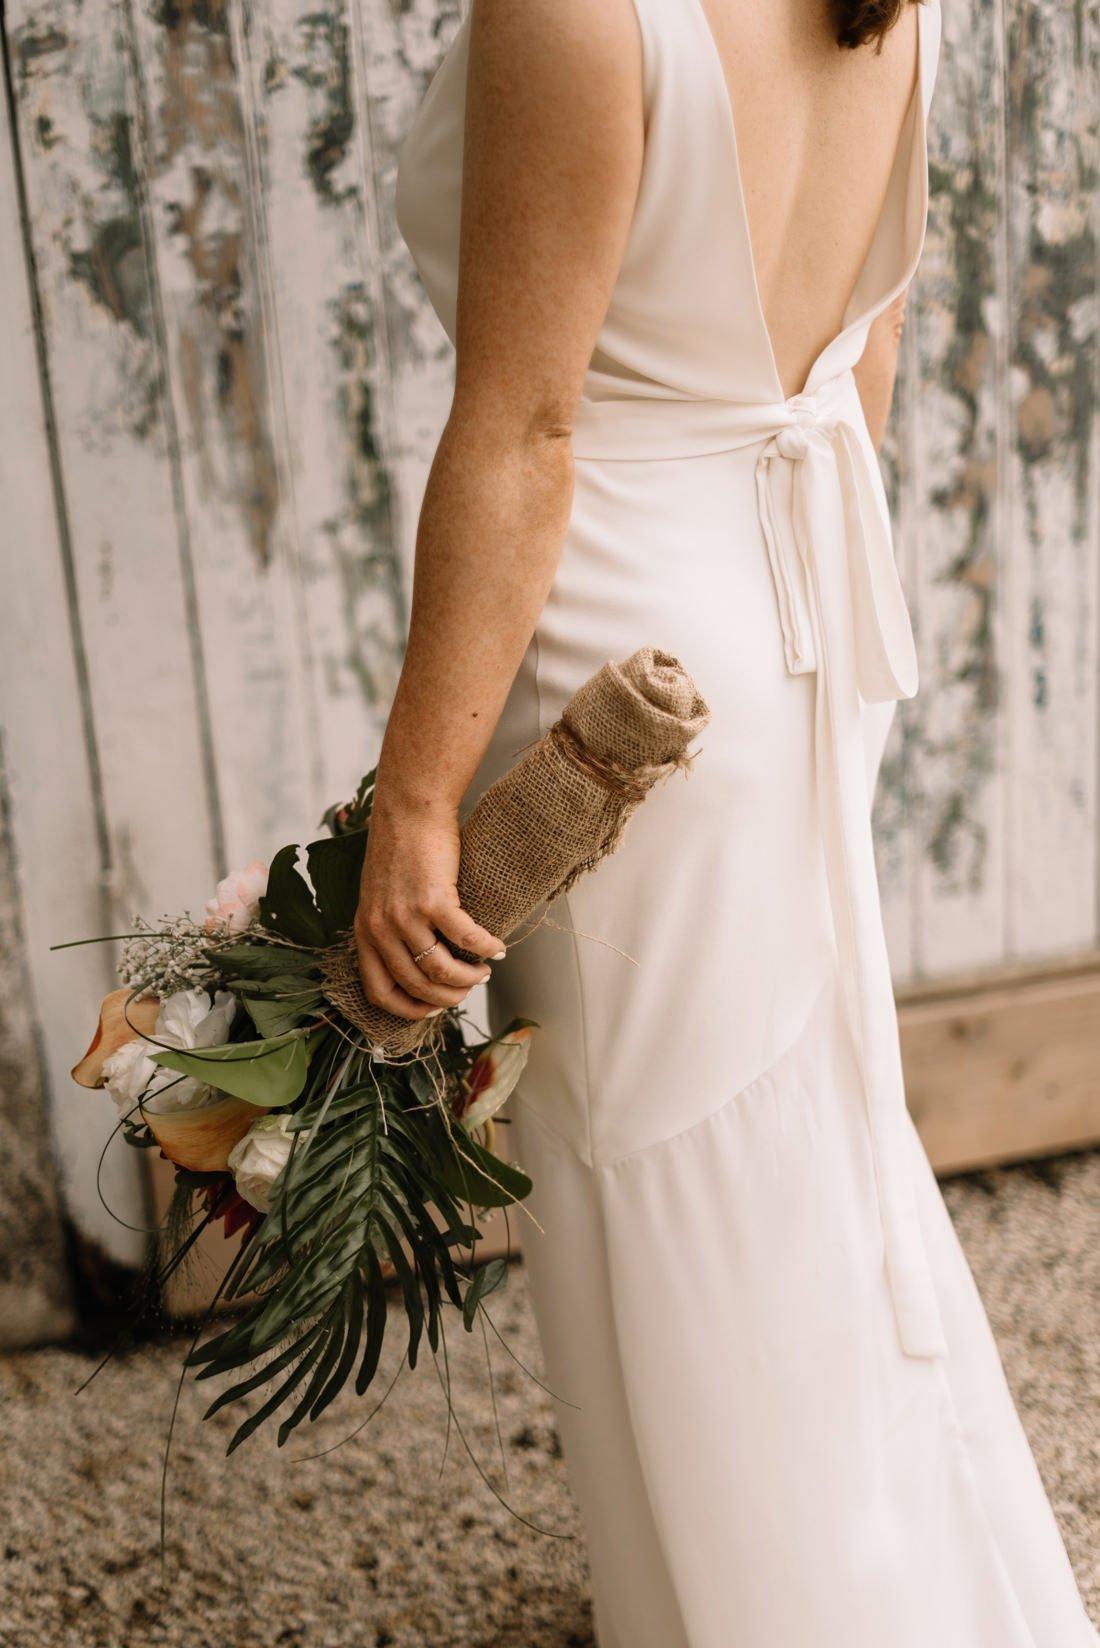 167 summer wedding at the millhouse slane wedding photorapher ireland